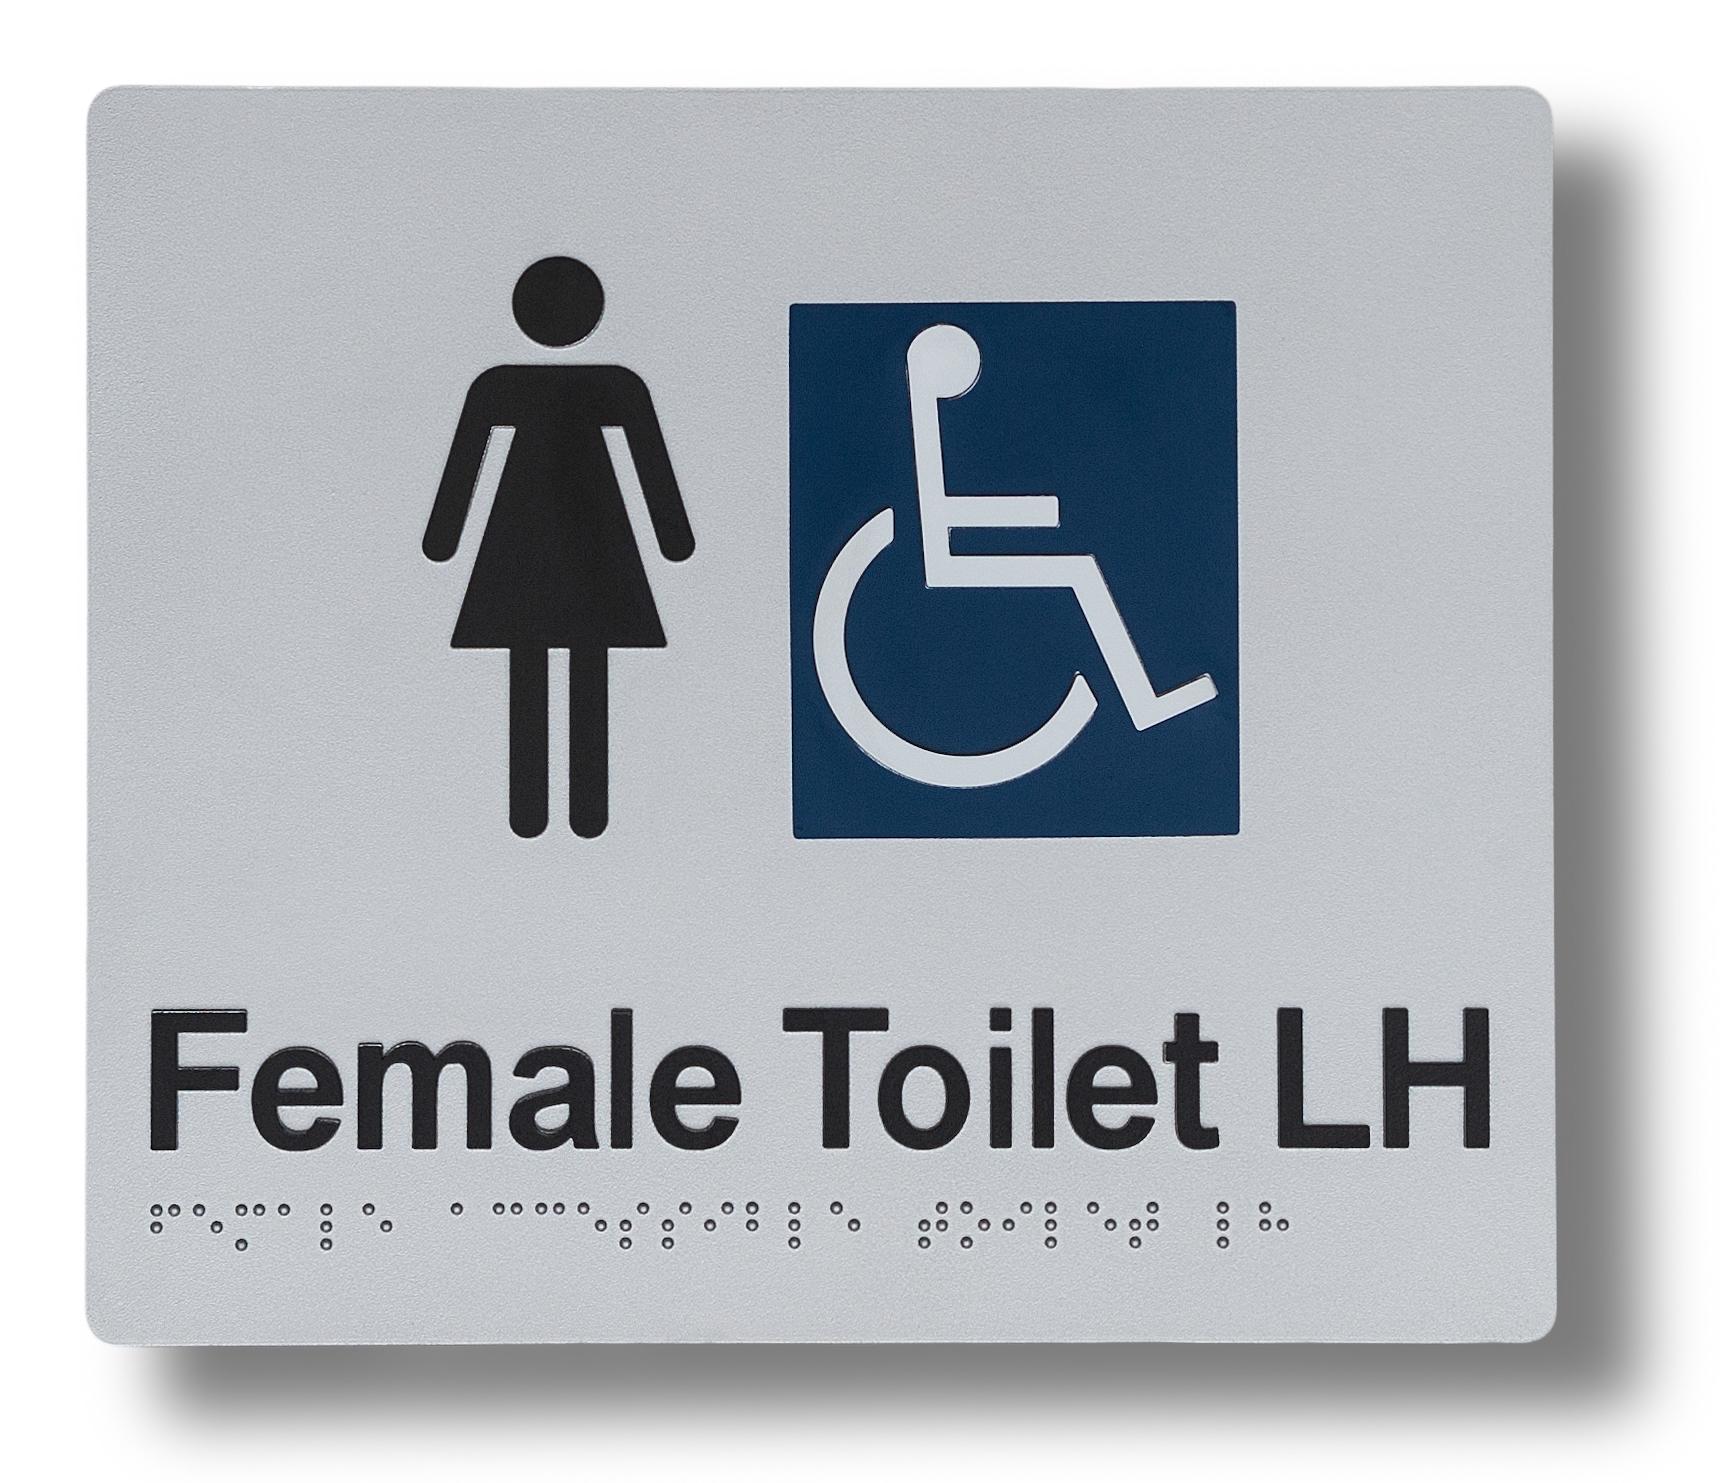 Braille sign - Female Toilet